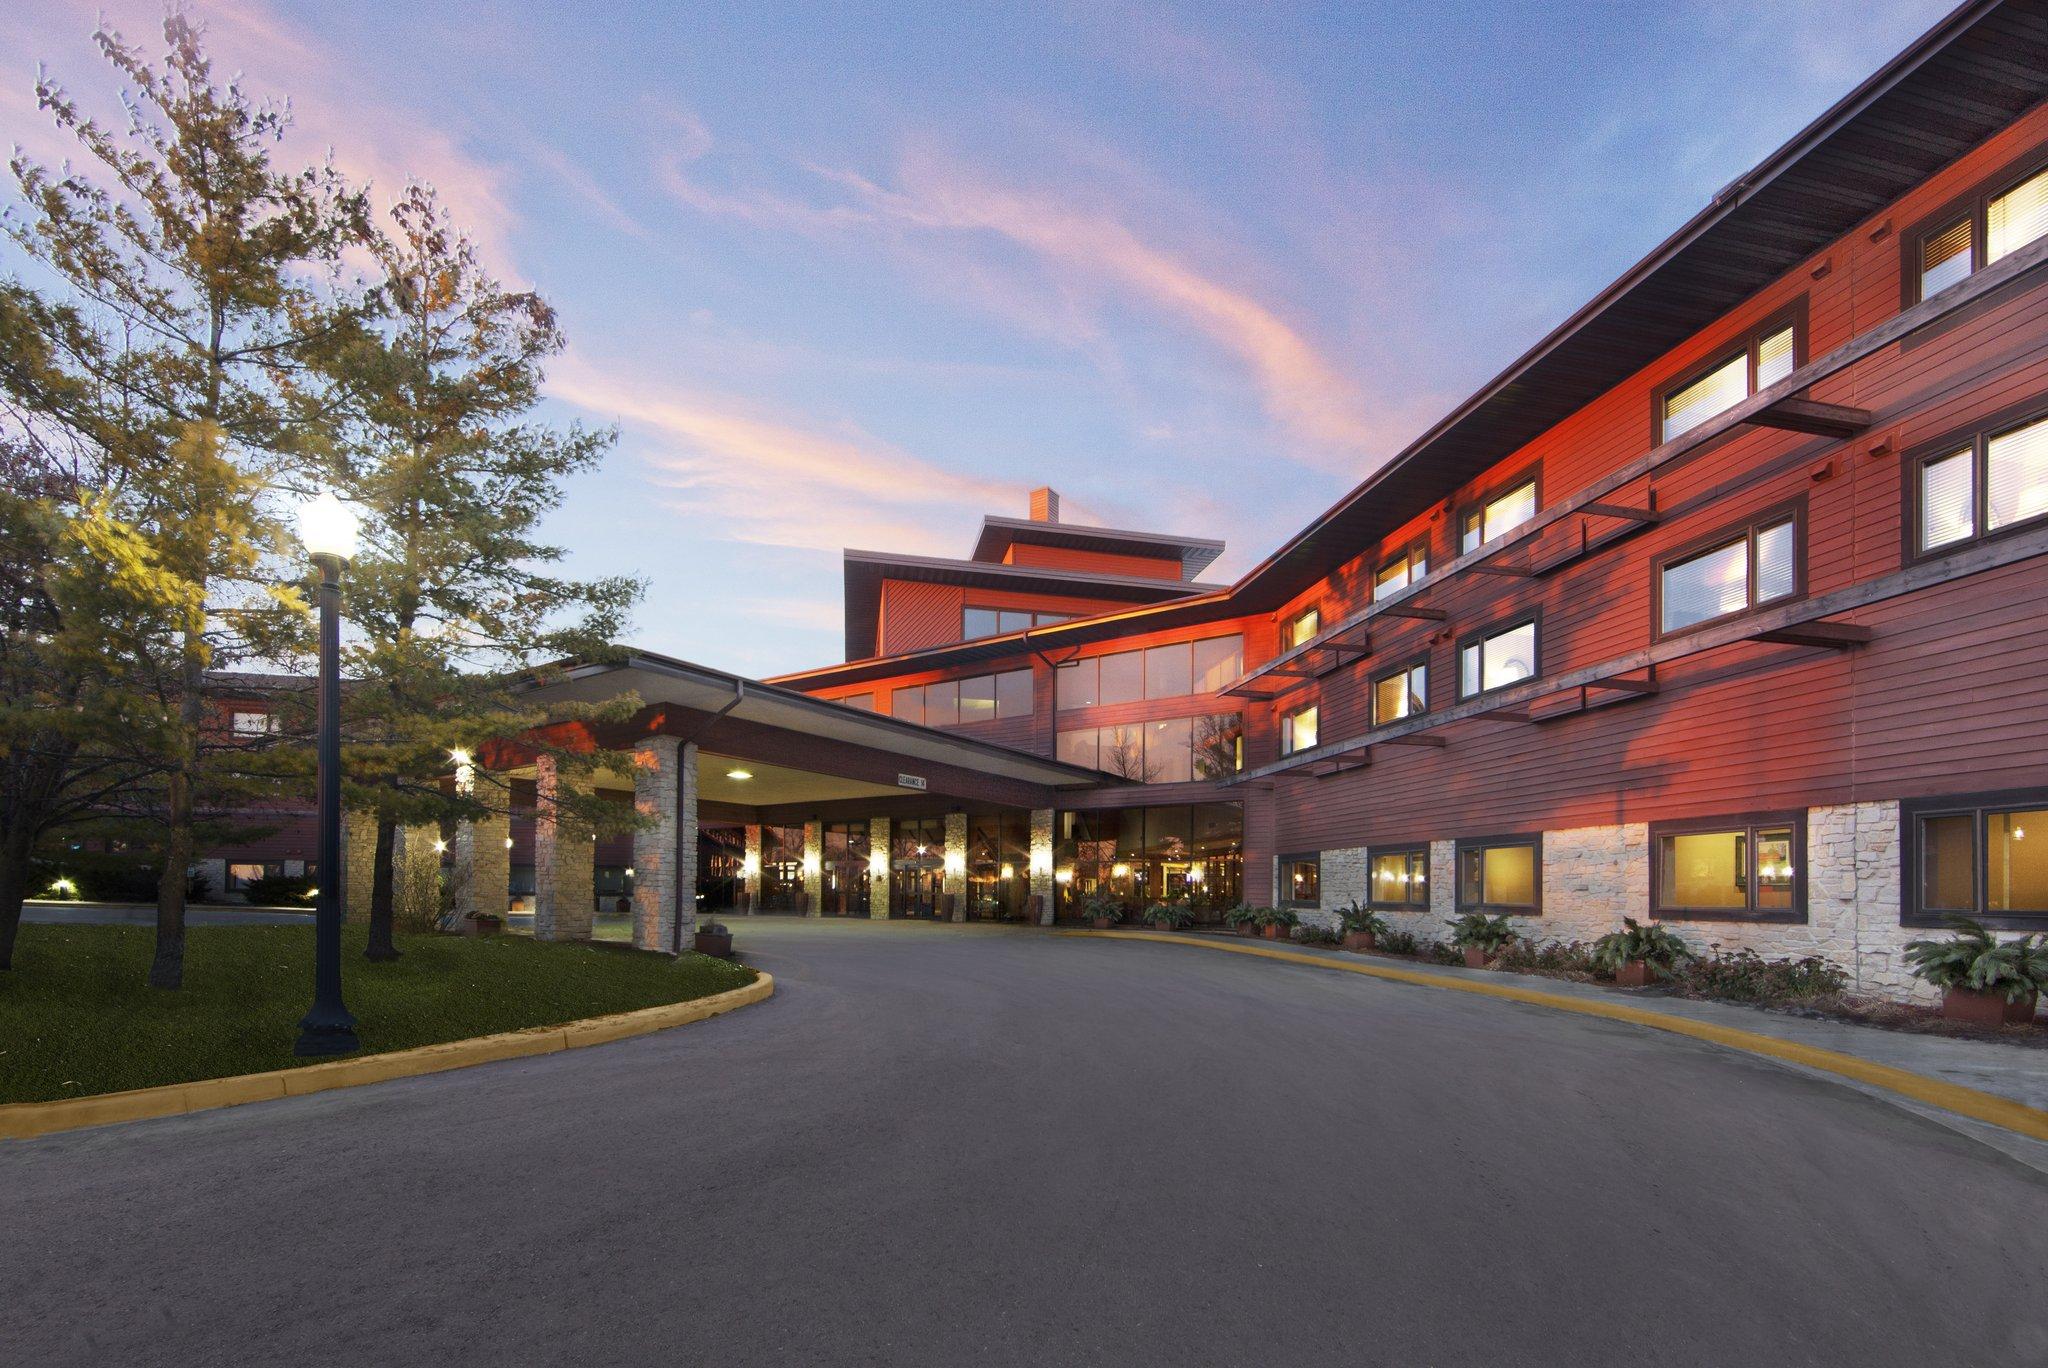 Radisson Hotel & Conference Green Bay